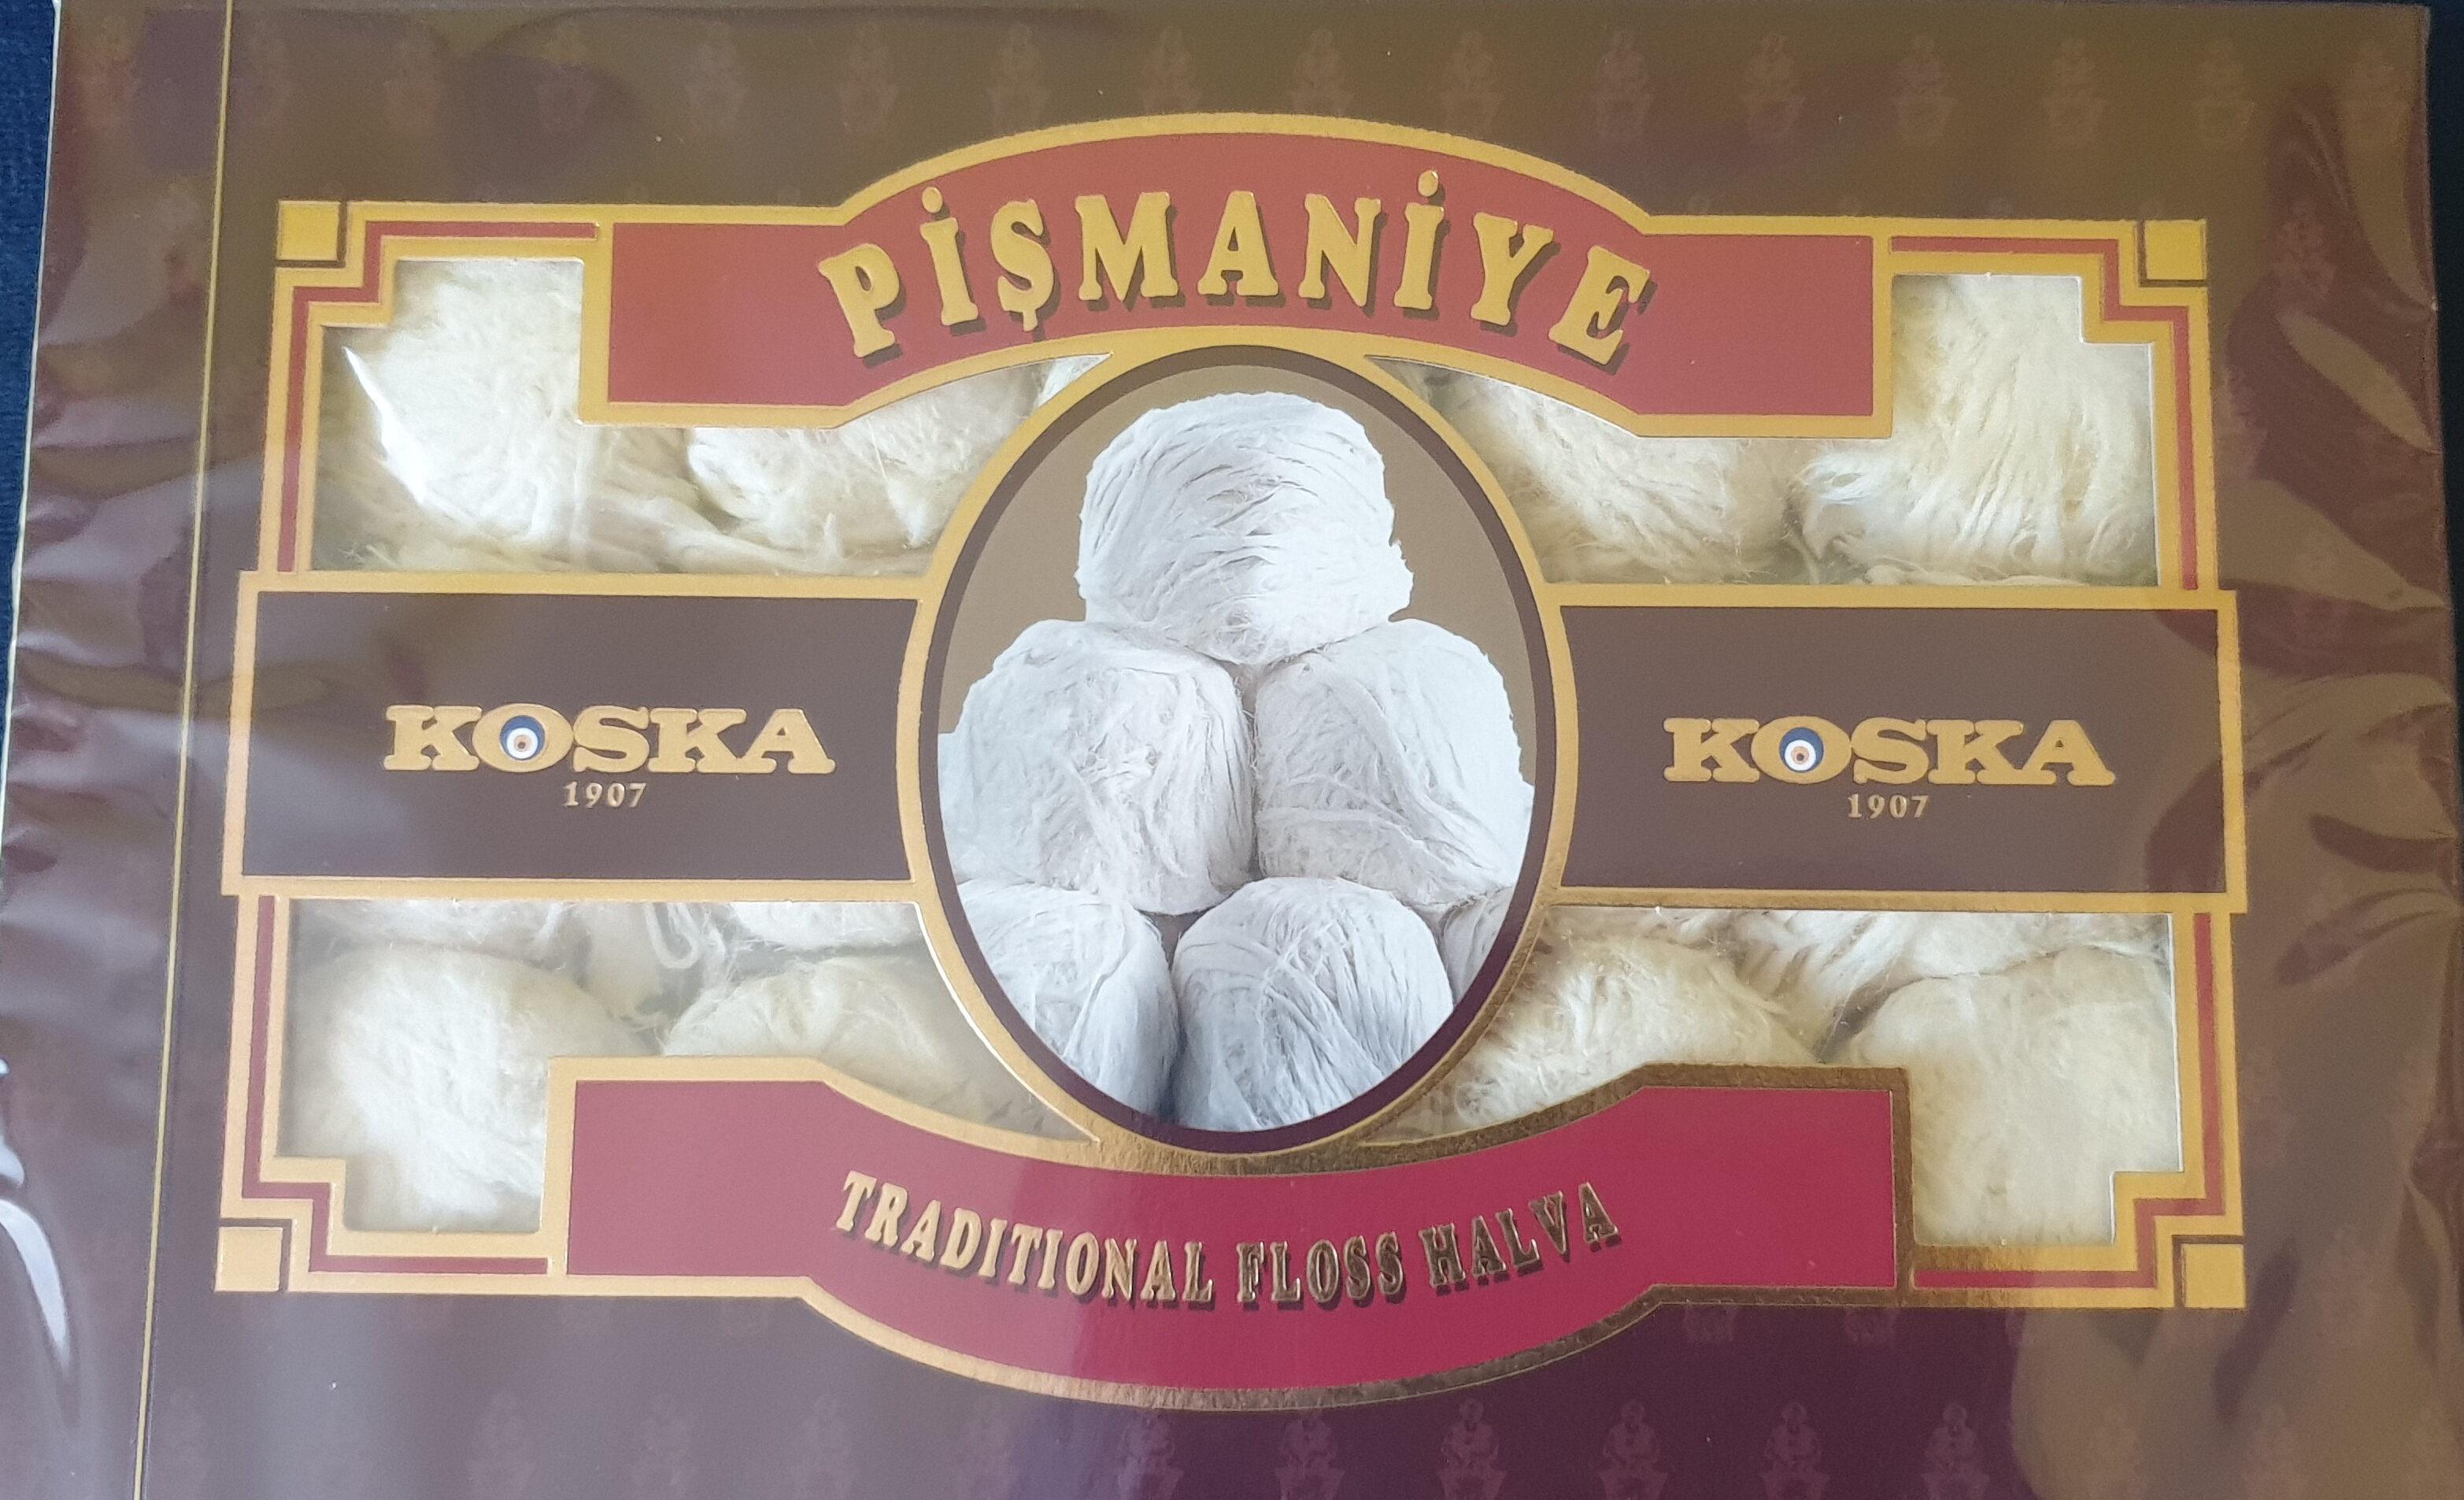 Traditional Floss Halva - Product - en